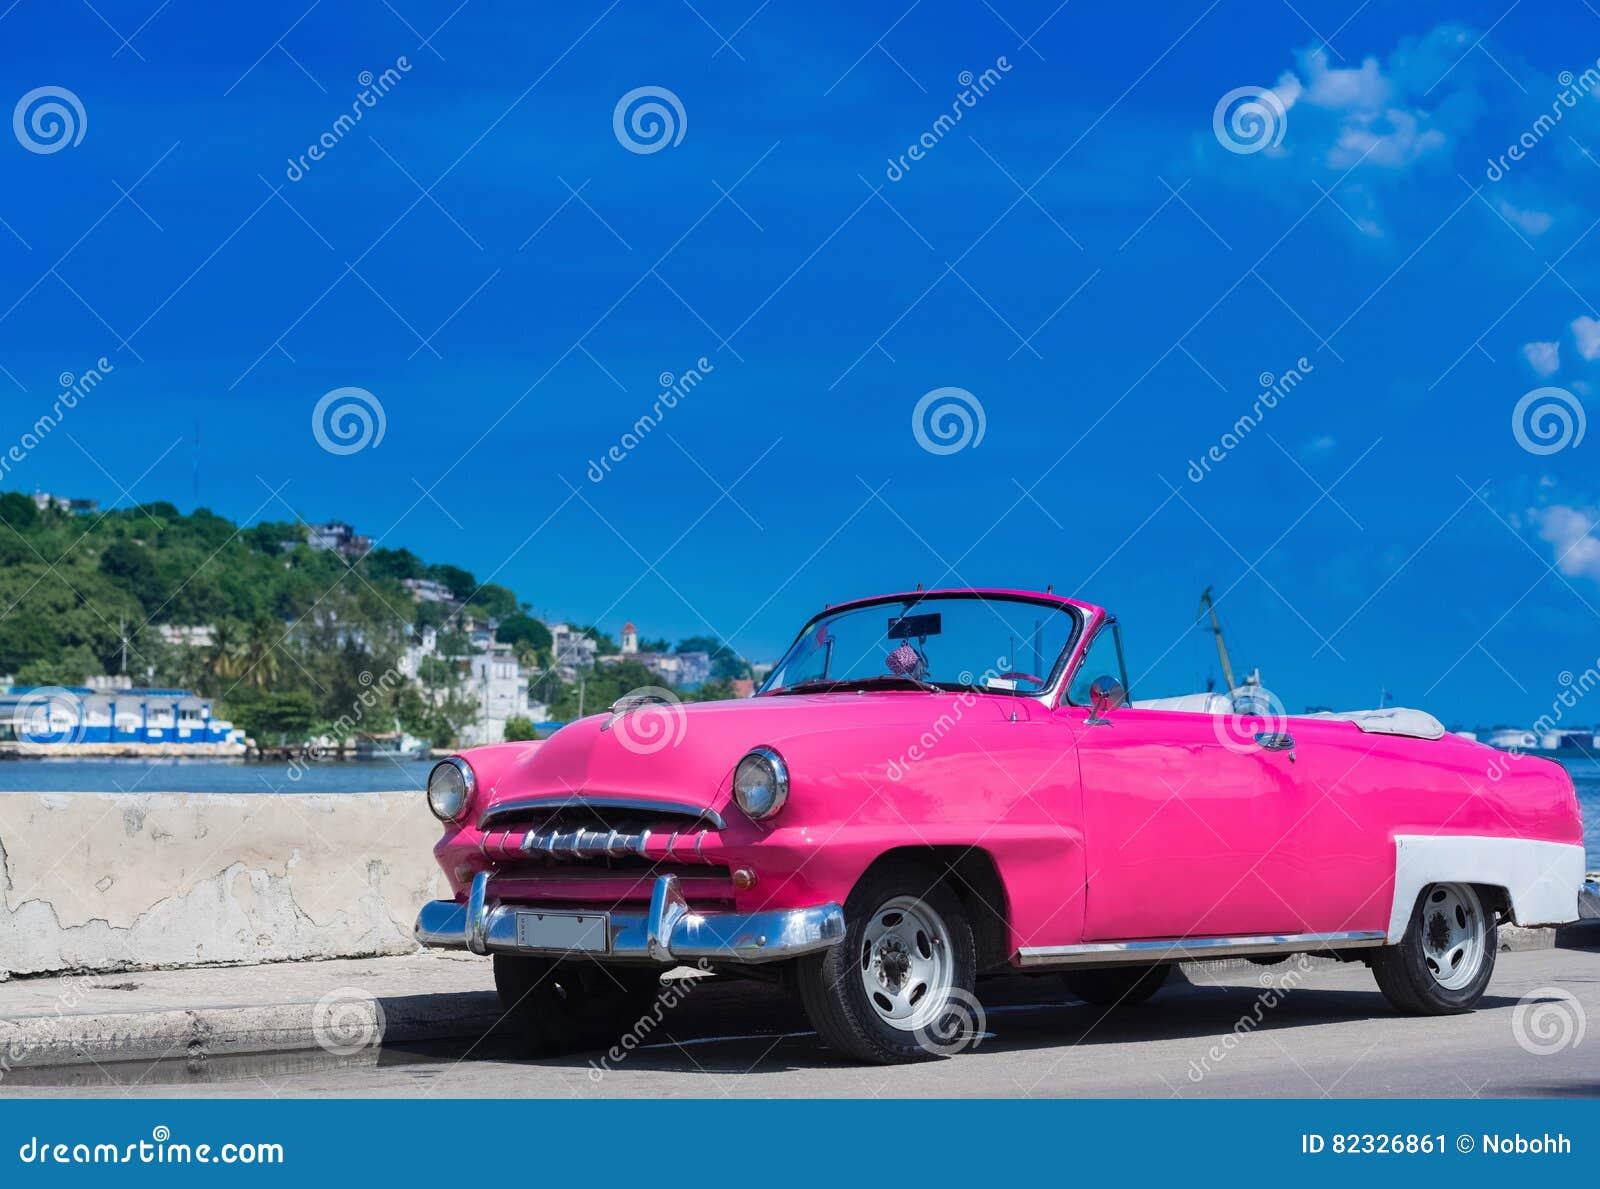 Midland Classic Cars